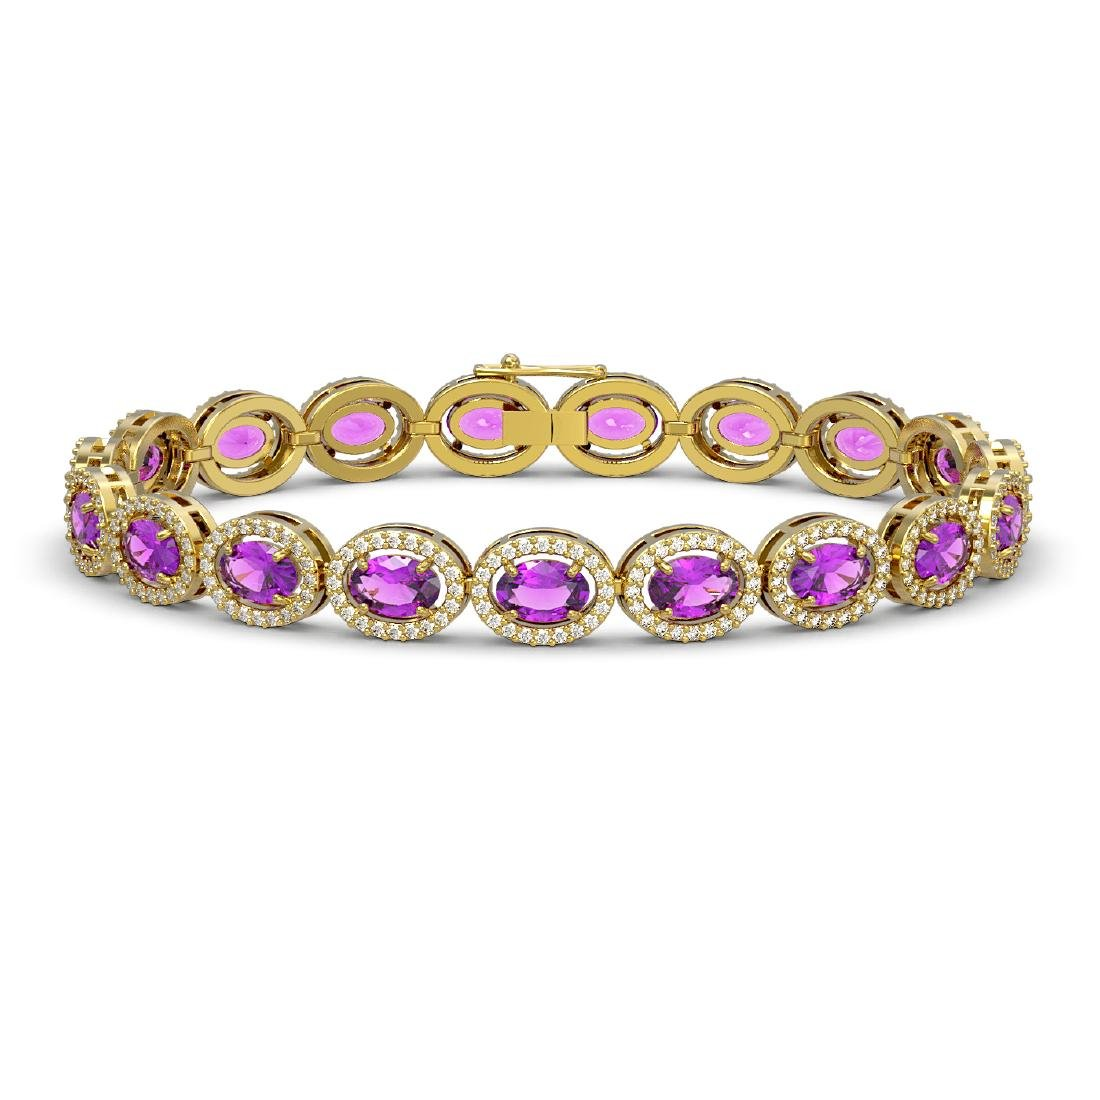 13.11 CTW Amethyst & Diamond Halo Bracelet 10K Yellow